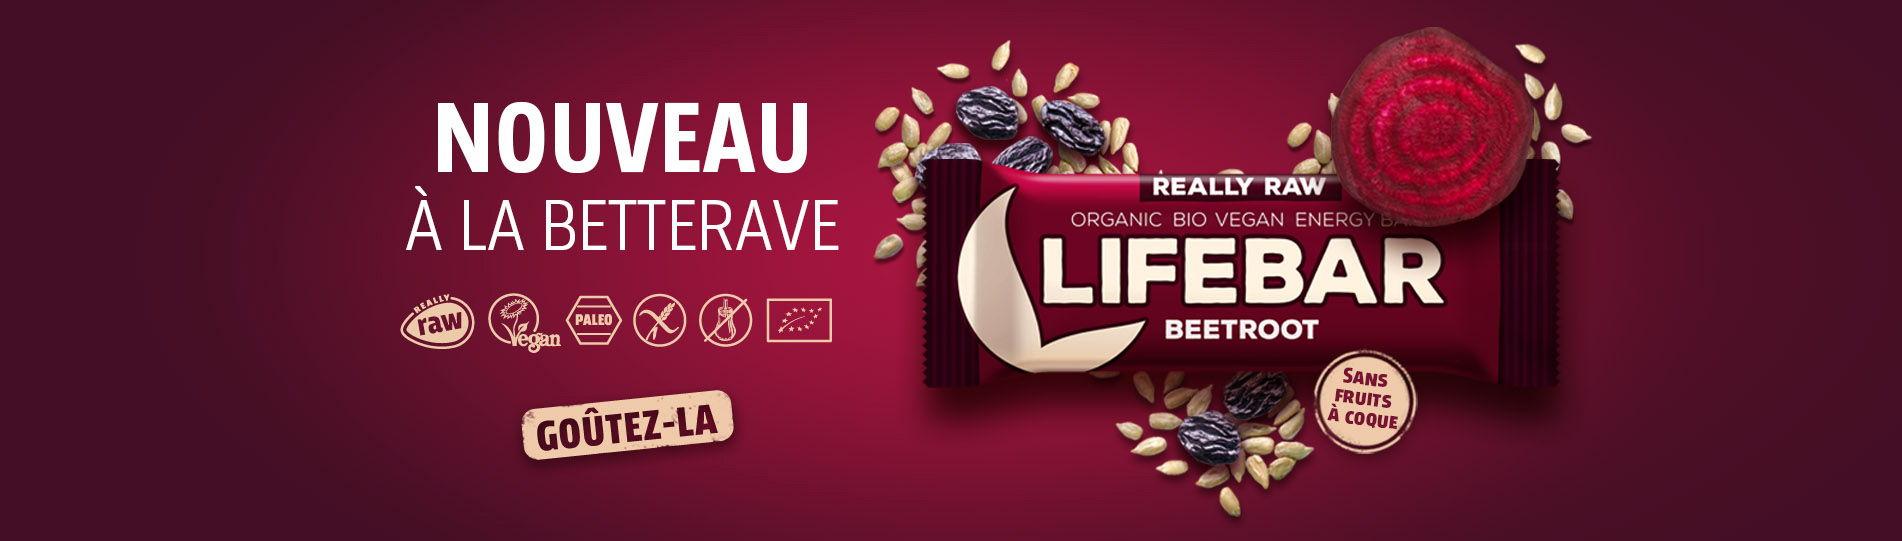 betterave Lifebar